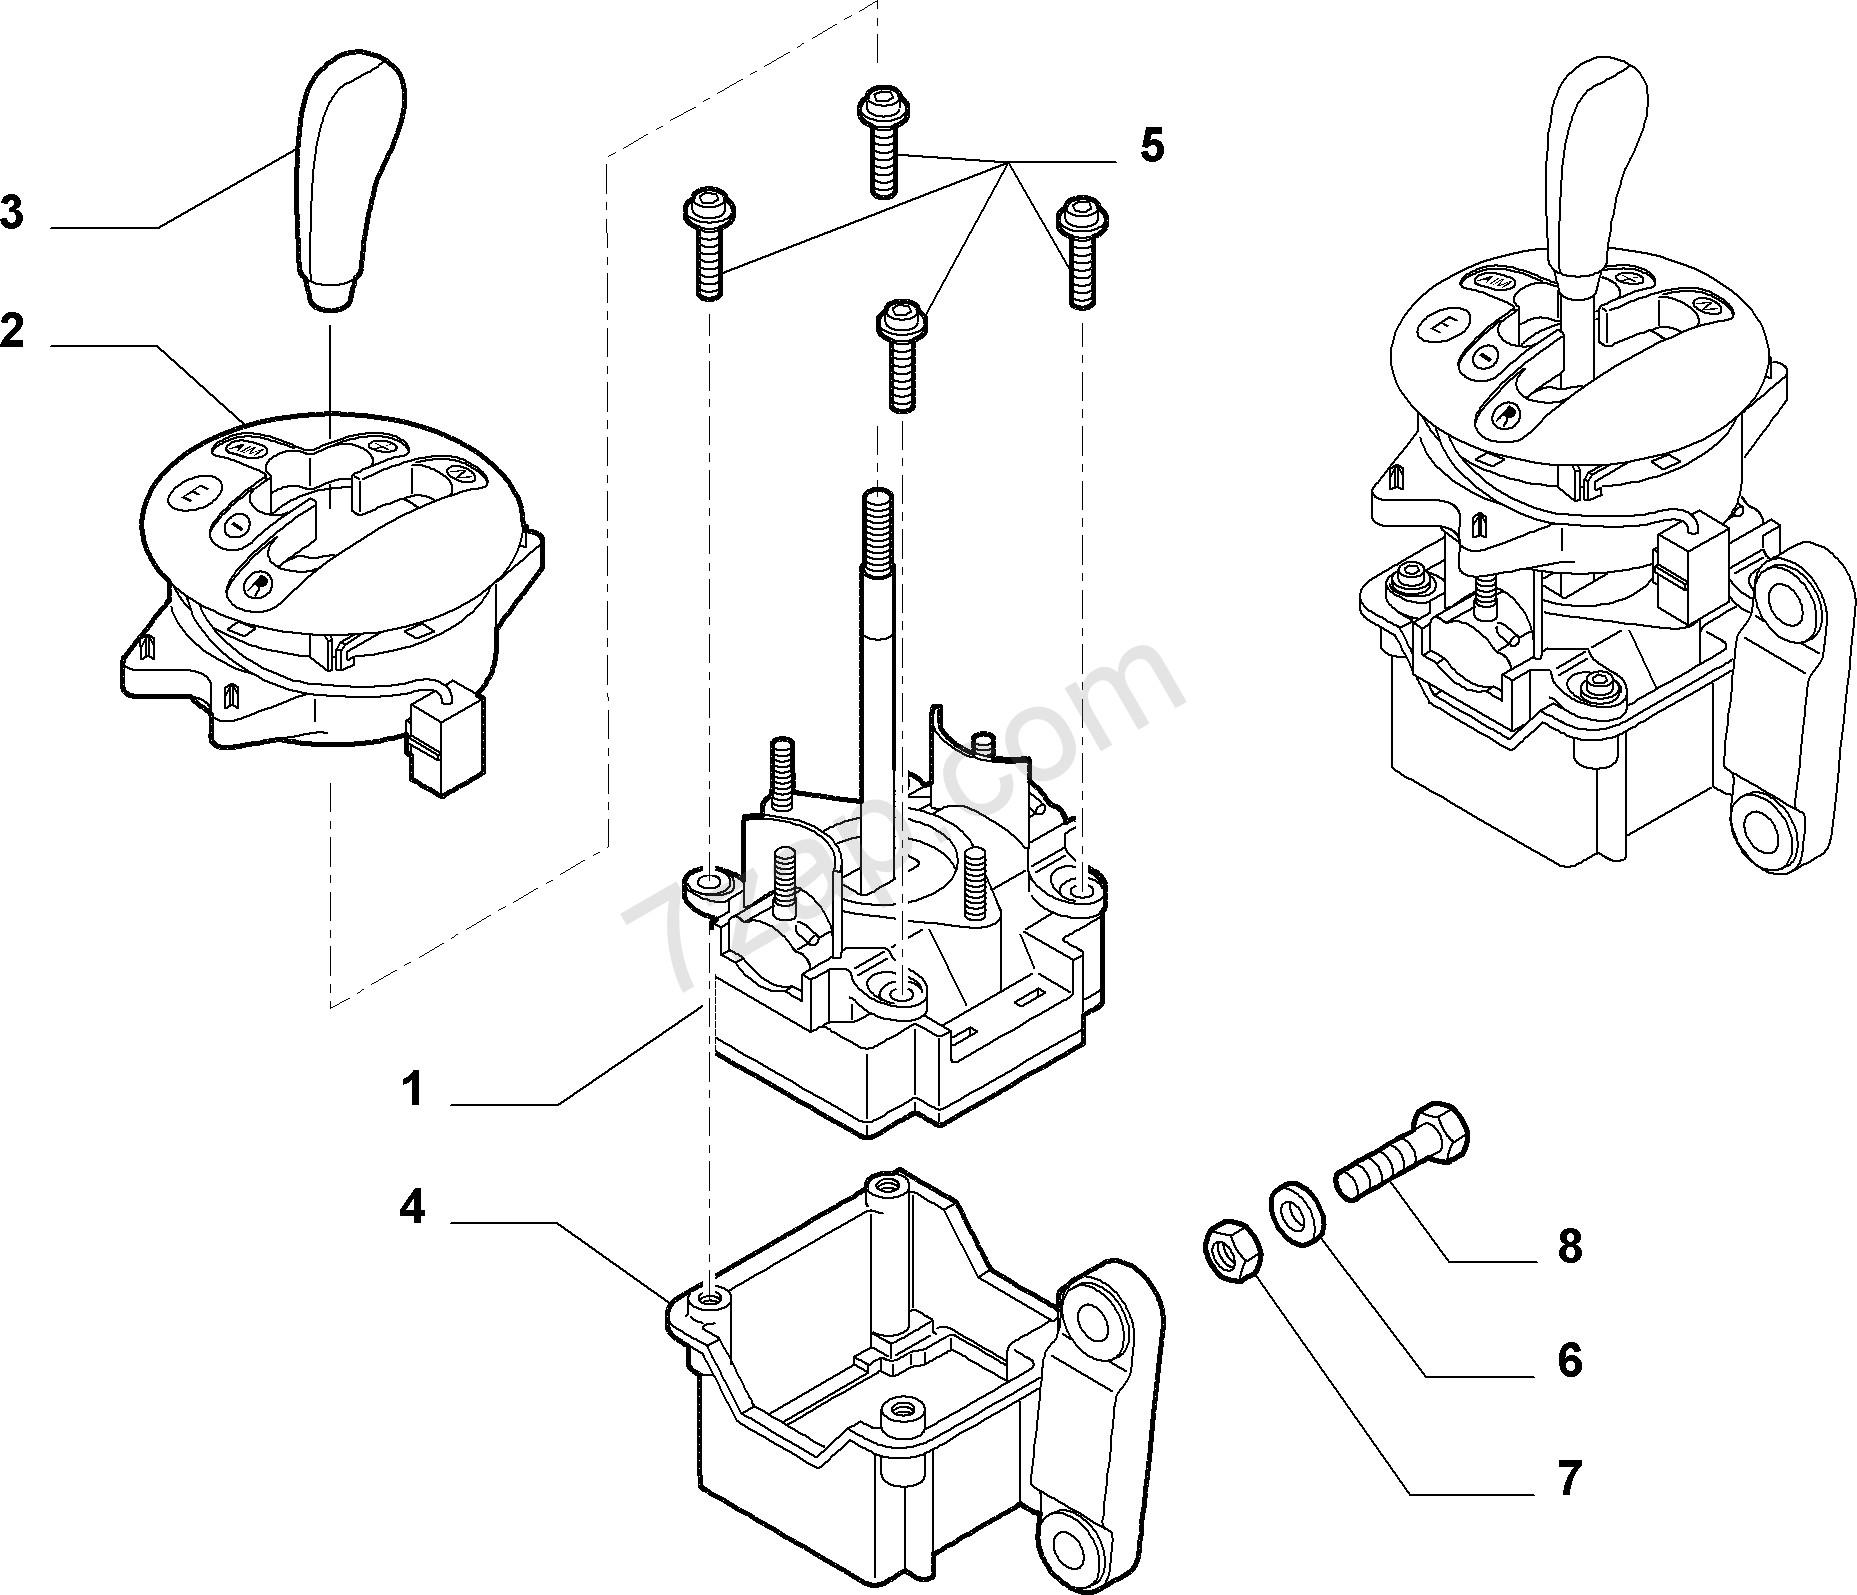 Diagram Of A Transmission Transmission Outer Controls Fiat Idea 2008 2012 Of Diagram Of A Transmission